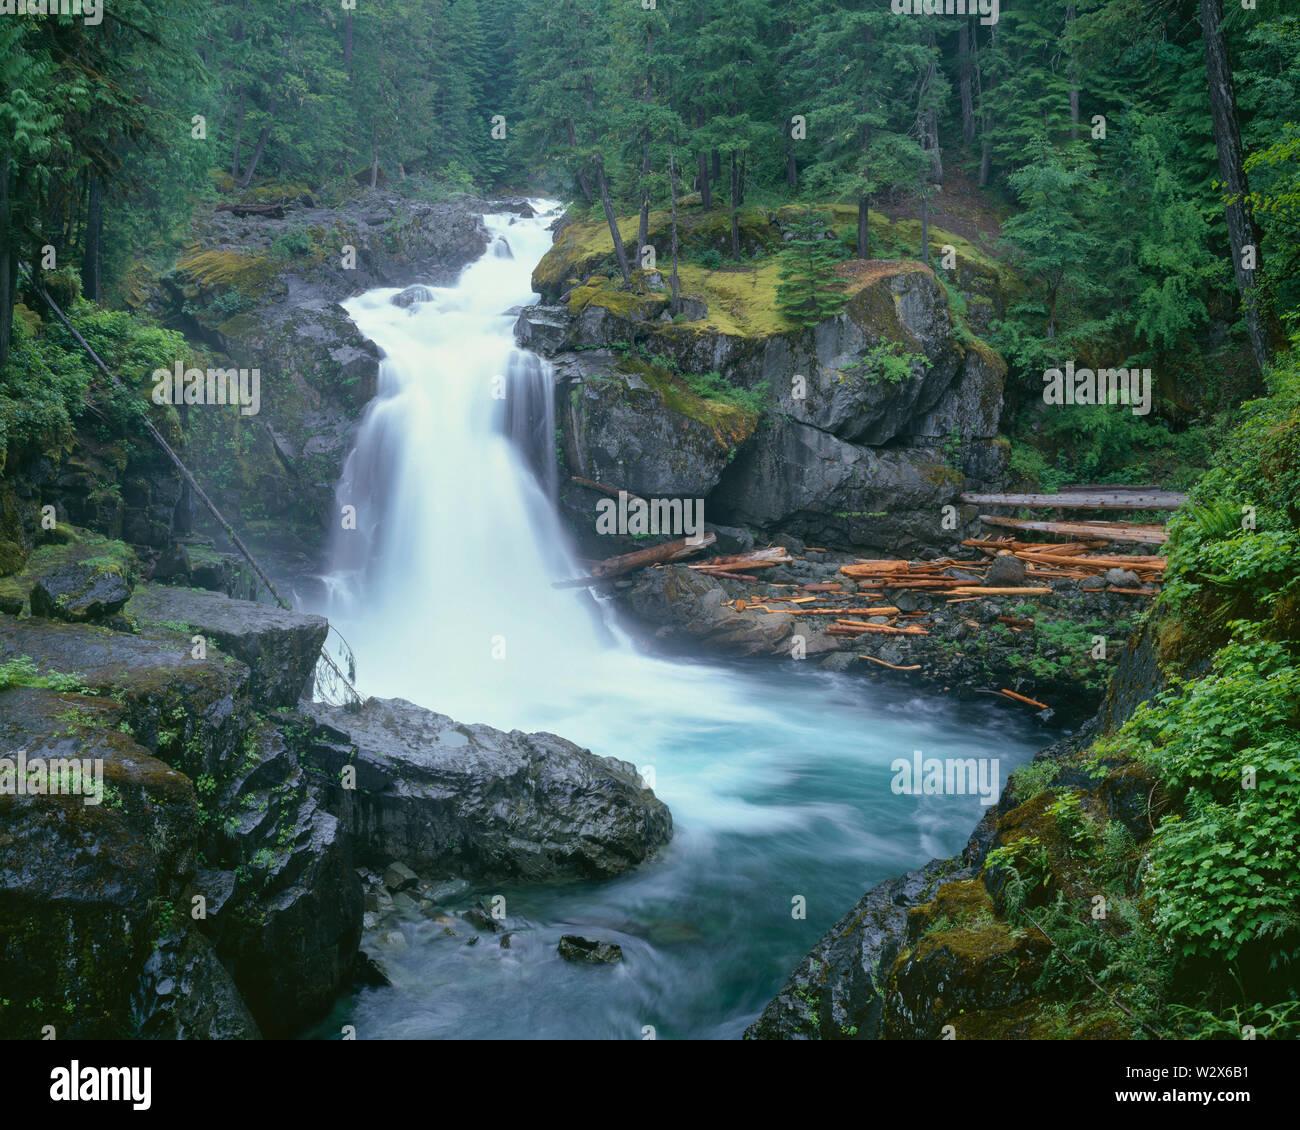 USA, Washington, Mt. Rainier National Park, Silver Falls on the Ohanepecosh River. - Stock Image